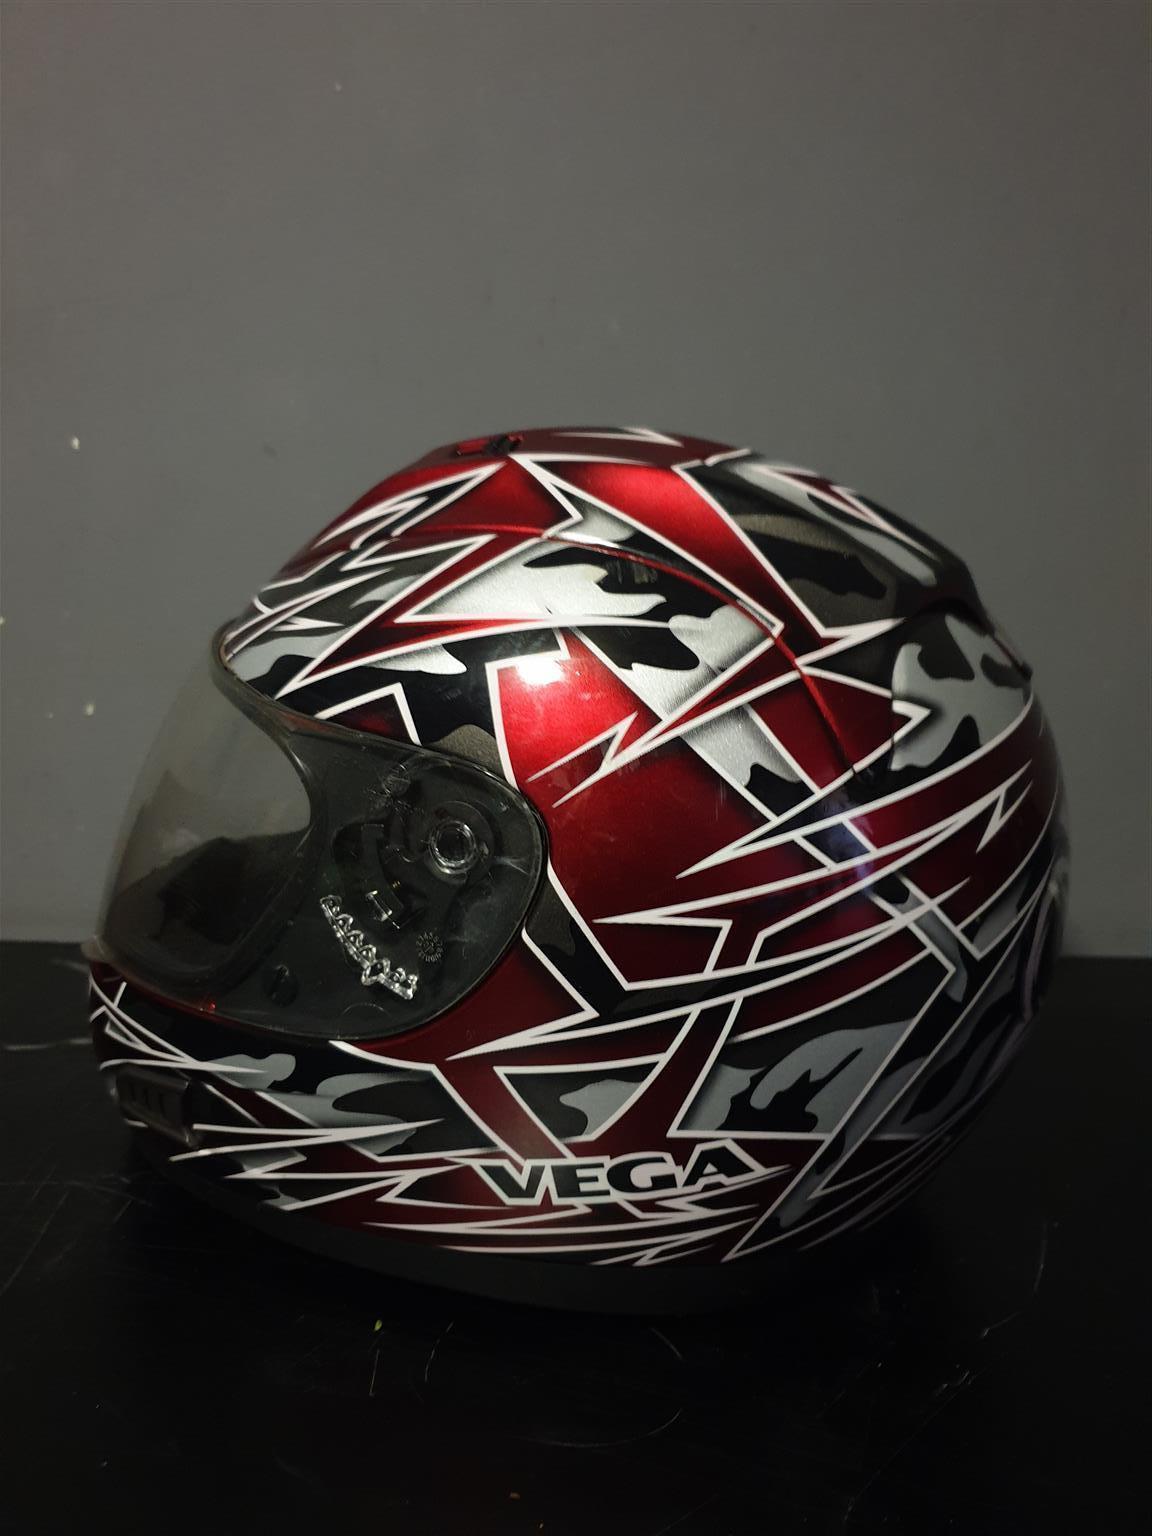 Vega ALTURA helmet